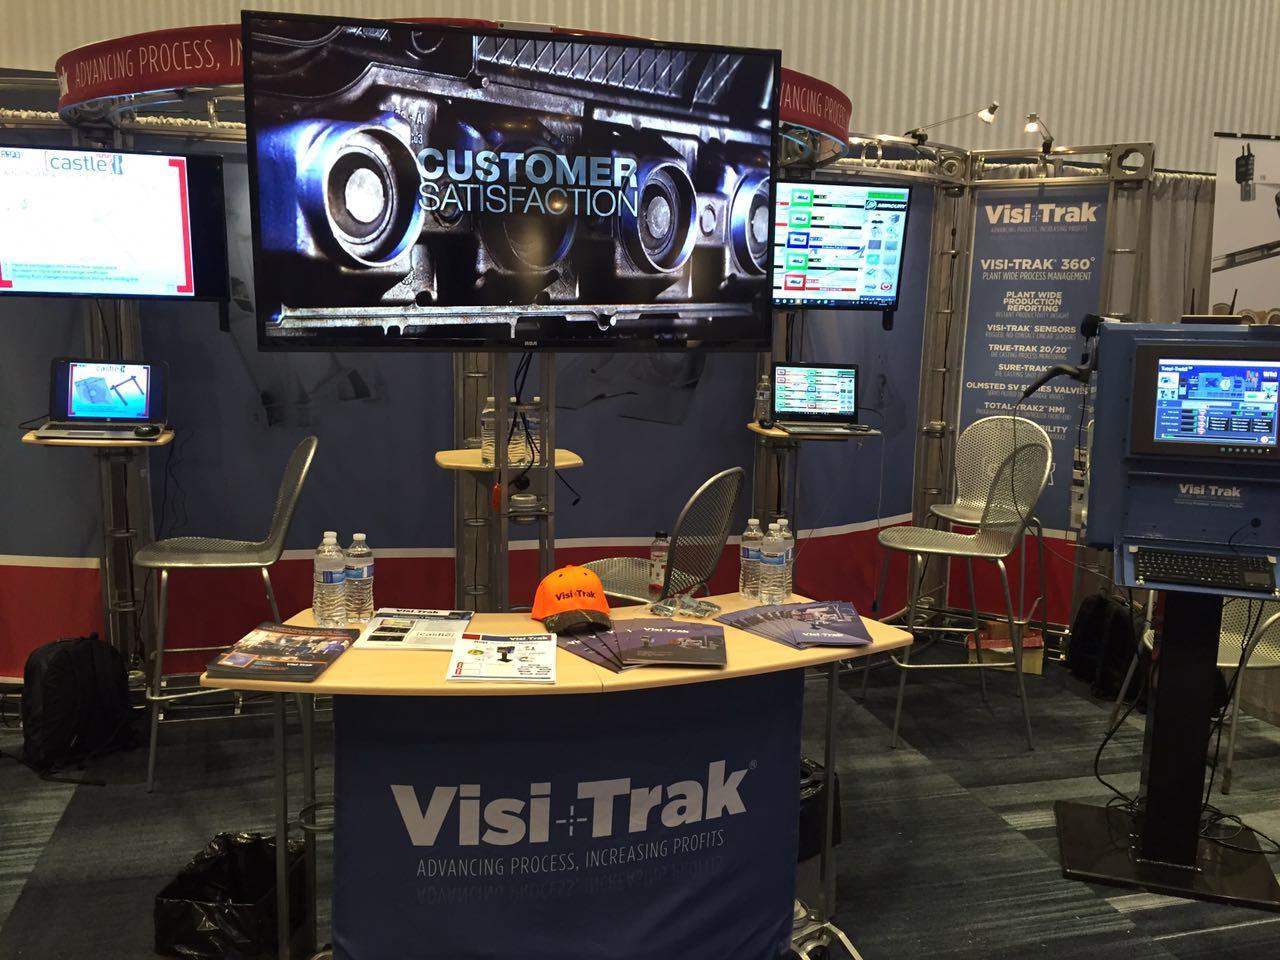 Visi-Trak Success at 2016 NADCA Die Casting Congress and Tabletop ...